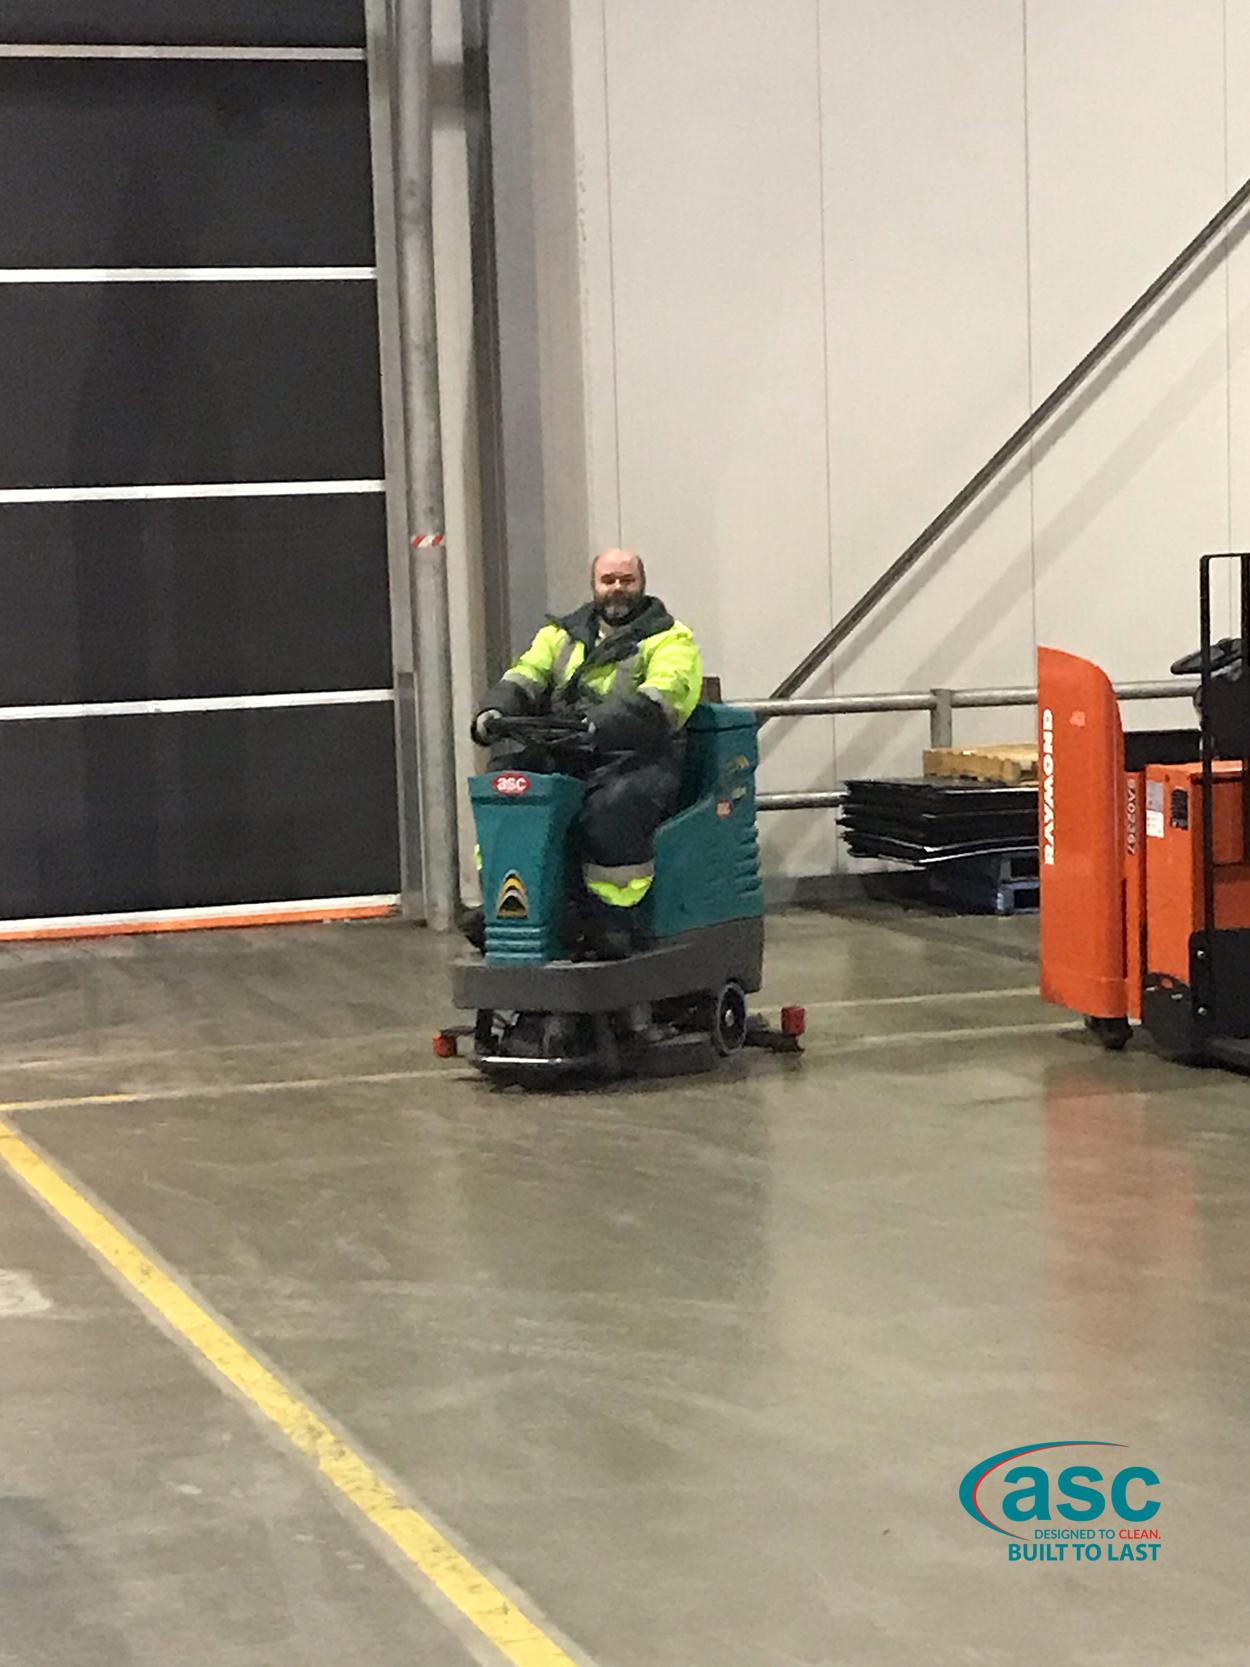 ASC Eureka E 83 Rider Scrubber At AHG's Facility 1